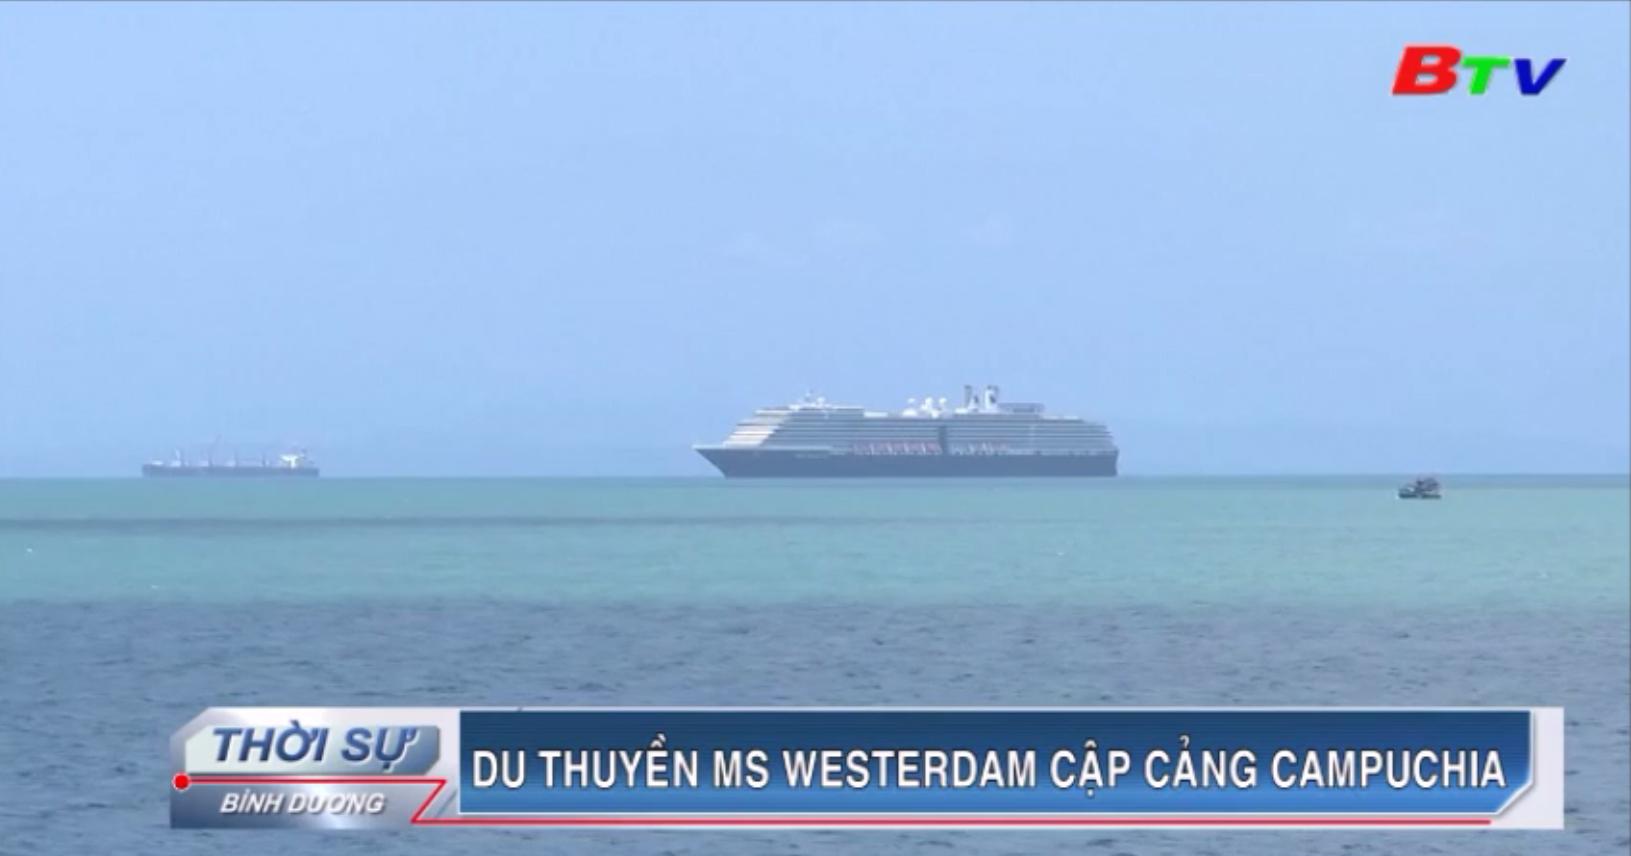 Du thuyền MS Westerdam cập cảng Campuchia